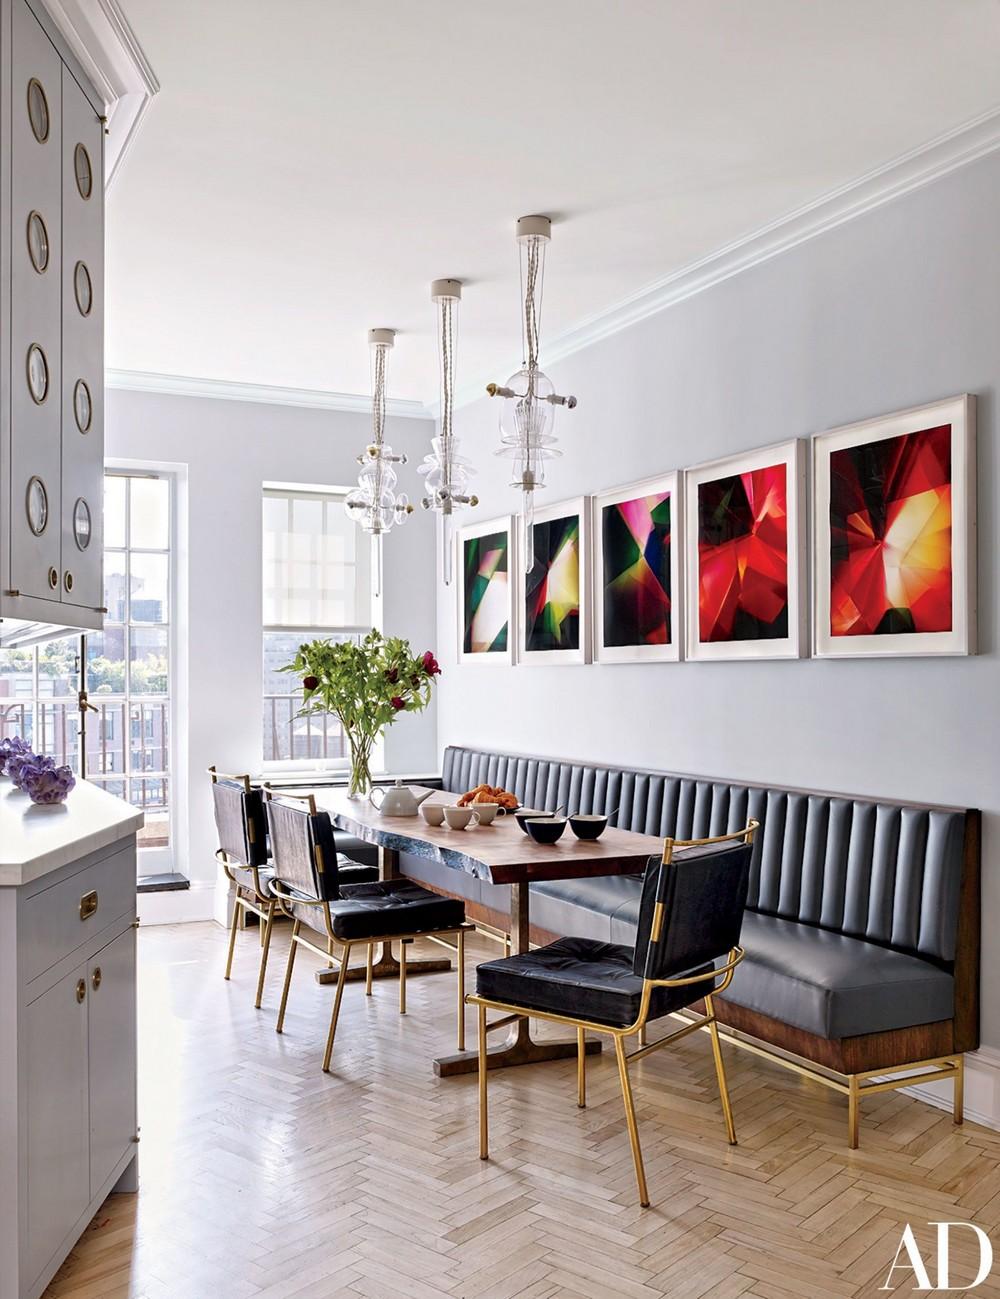 Rafael de Cárdenas: The Perfect Harmony Through Visionary Dining Rooms rafael de cárdenas Rafael de Cárdenas: The Perfect Harmony Through Visionary Dining Rooms 2 ad